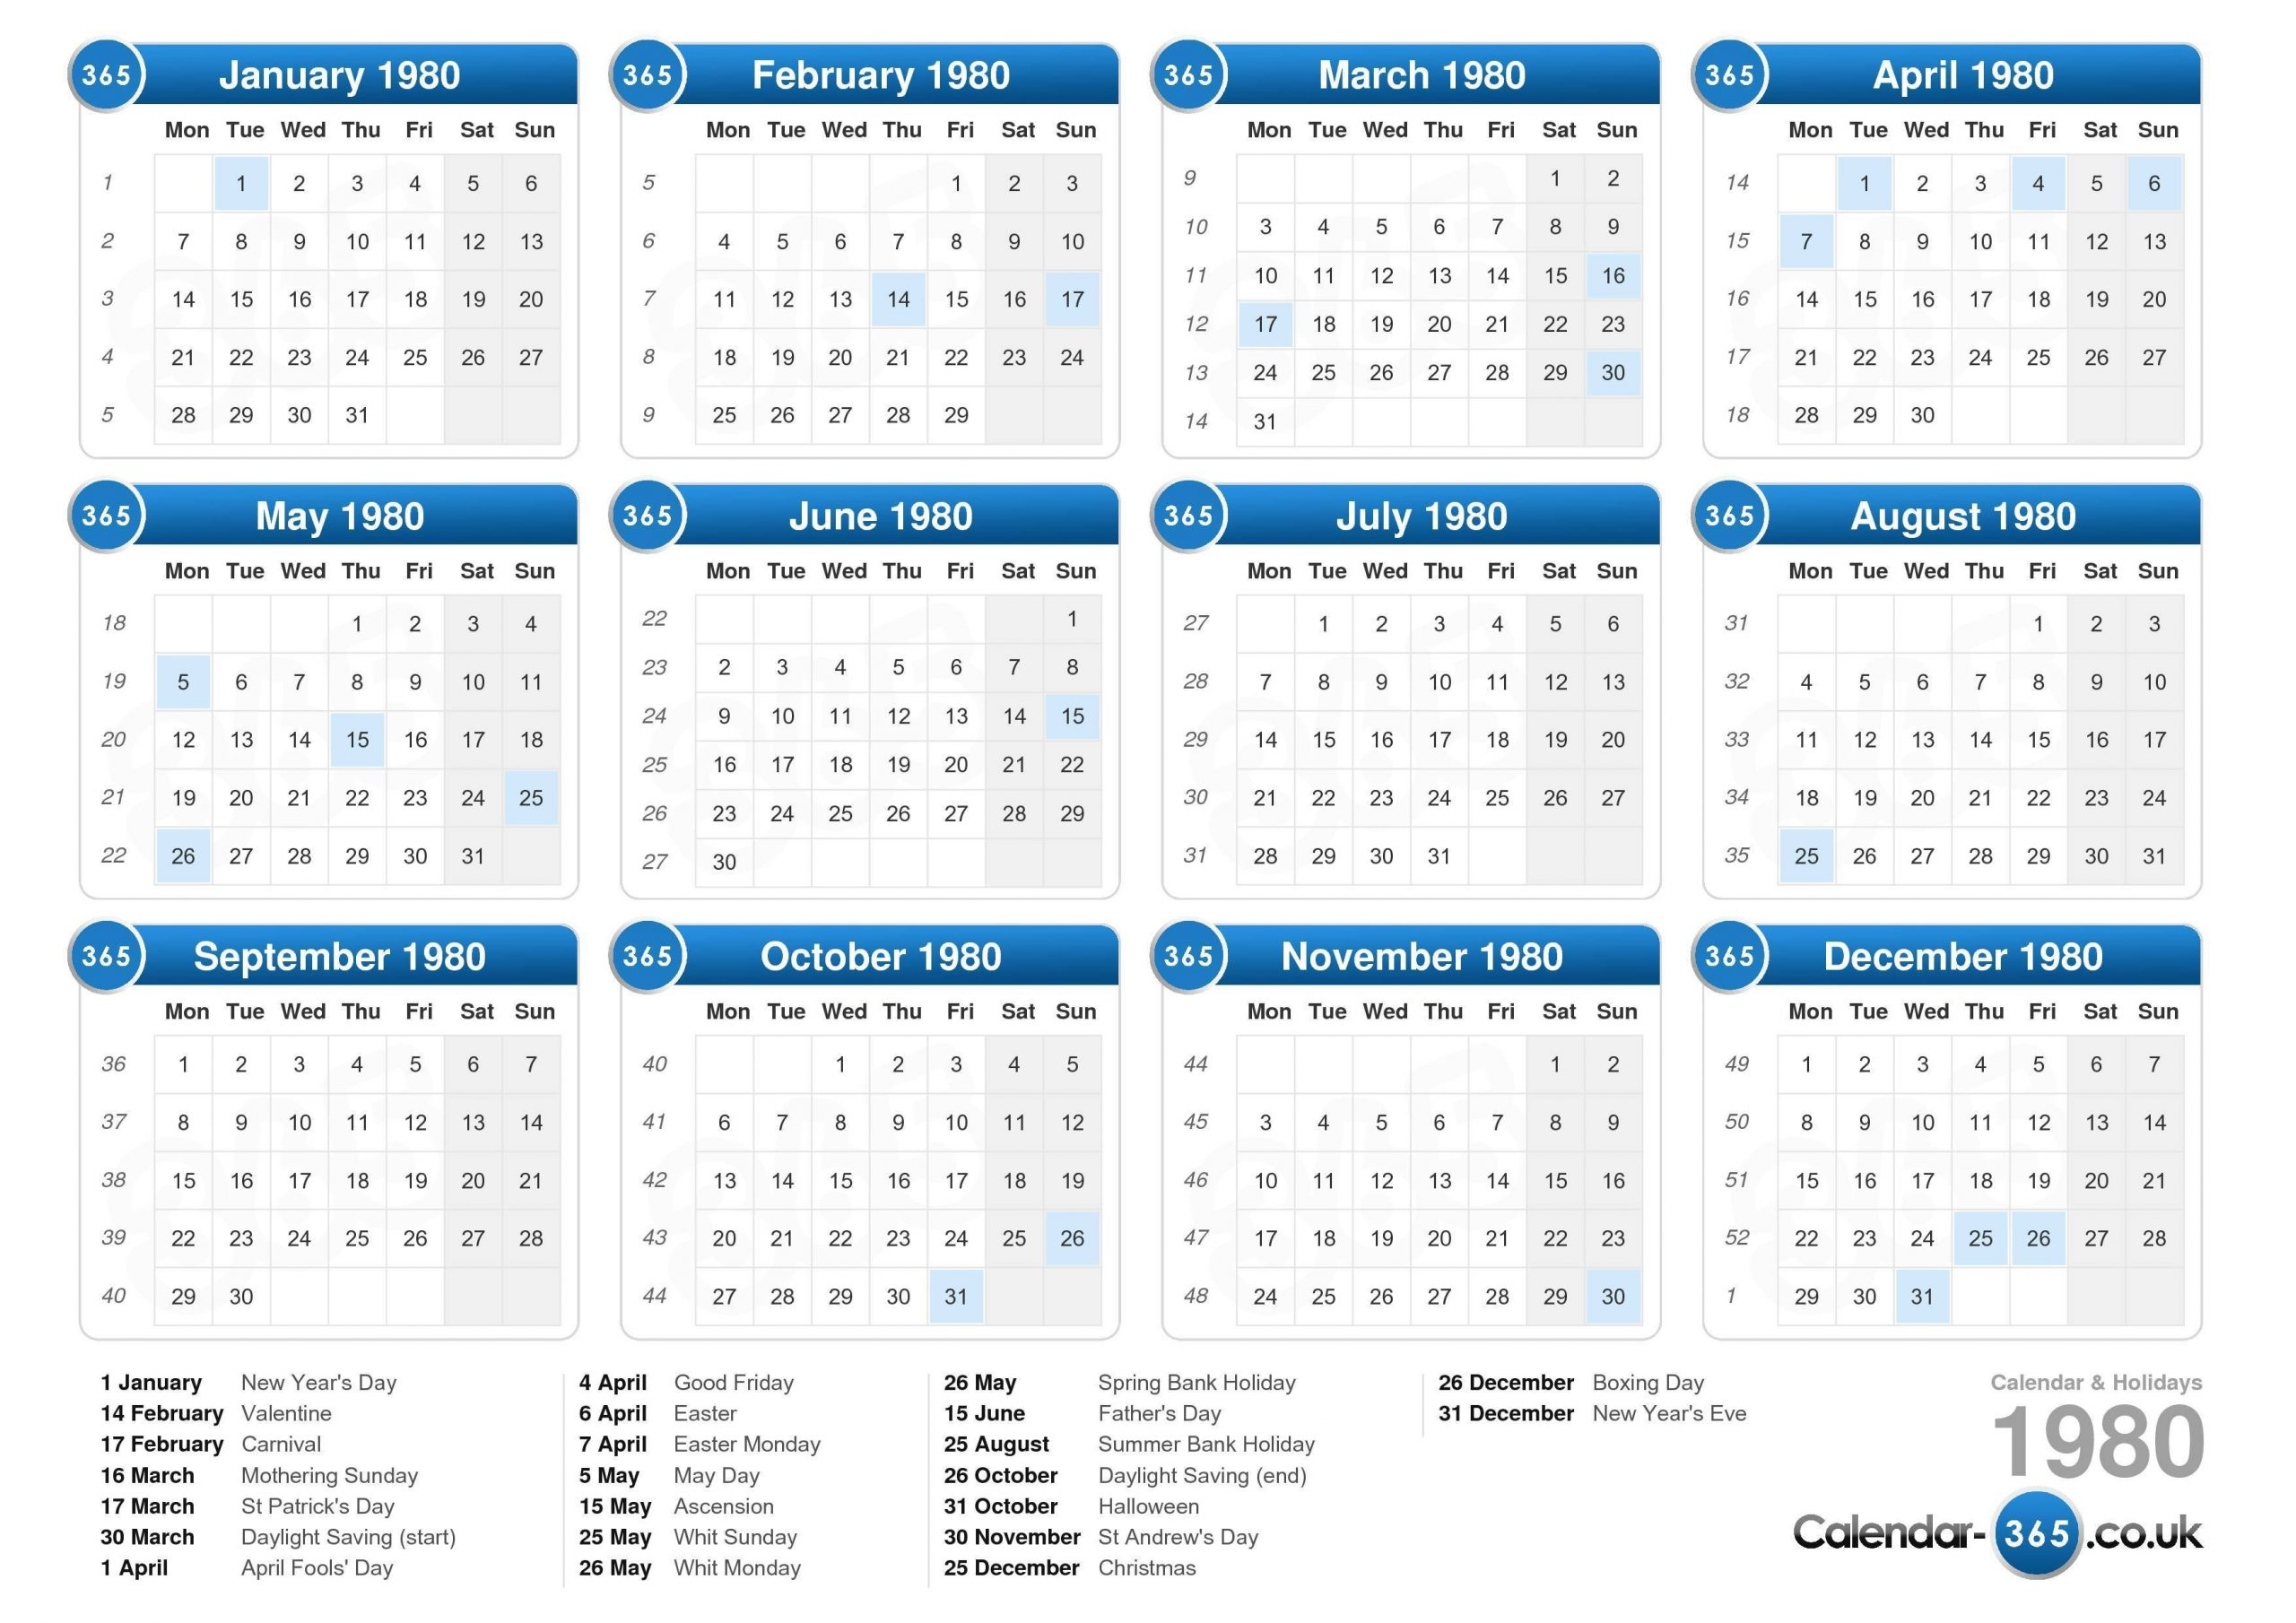 Calendar 1980 Calendar With Number Days 365